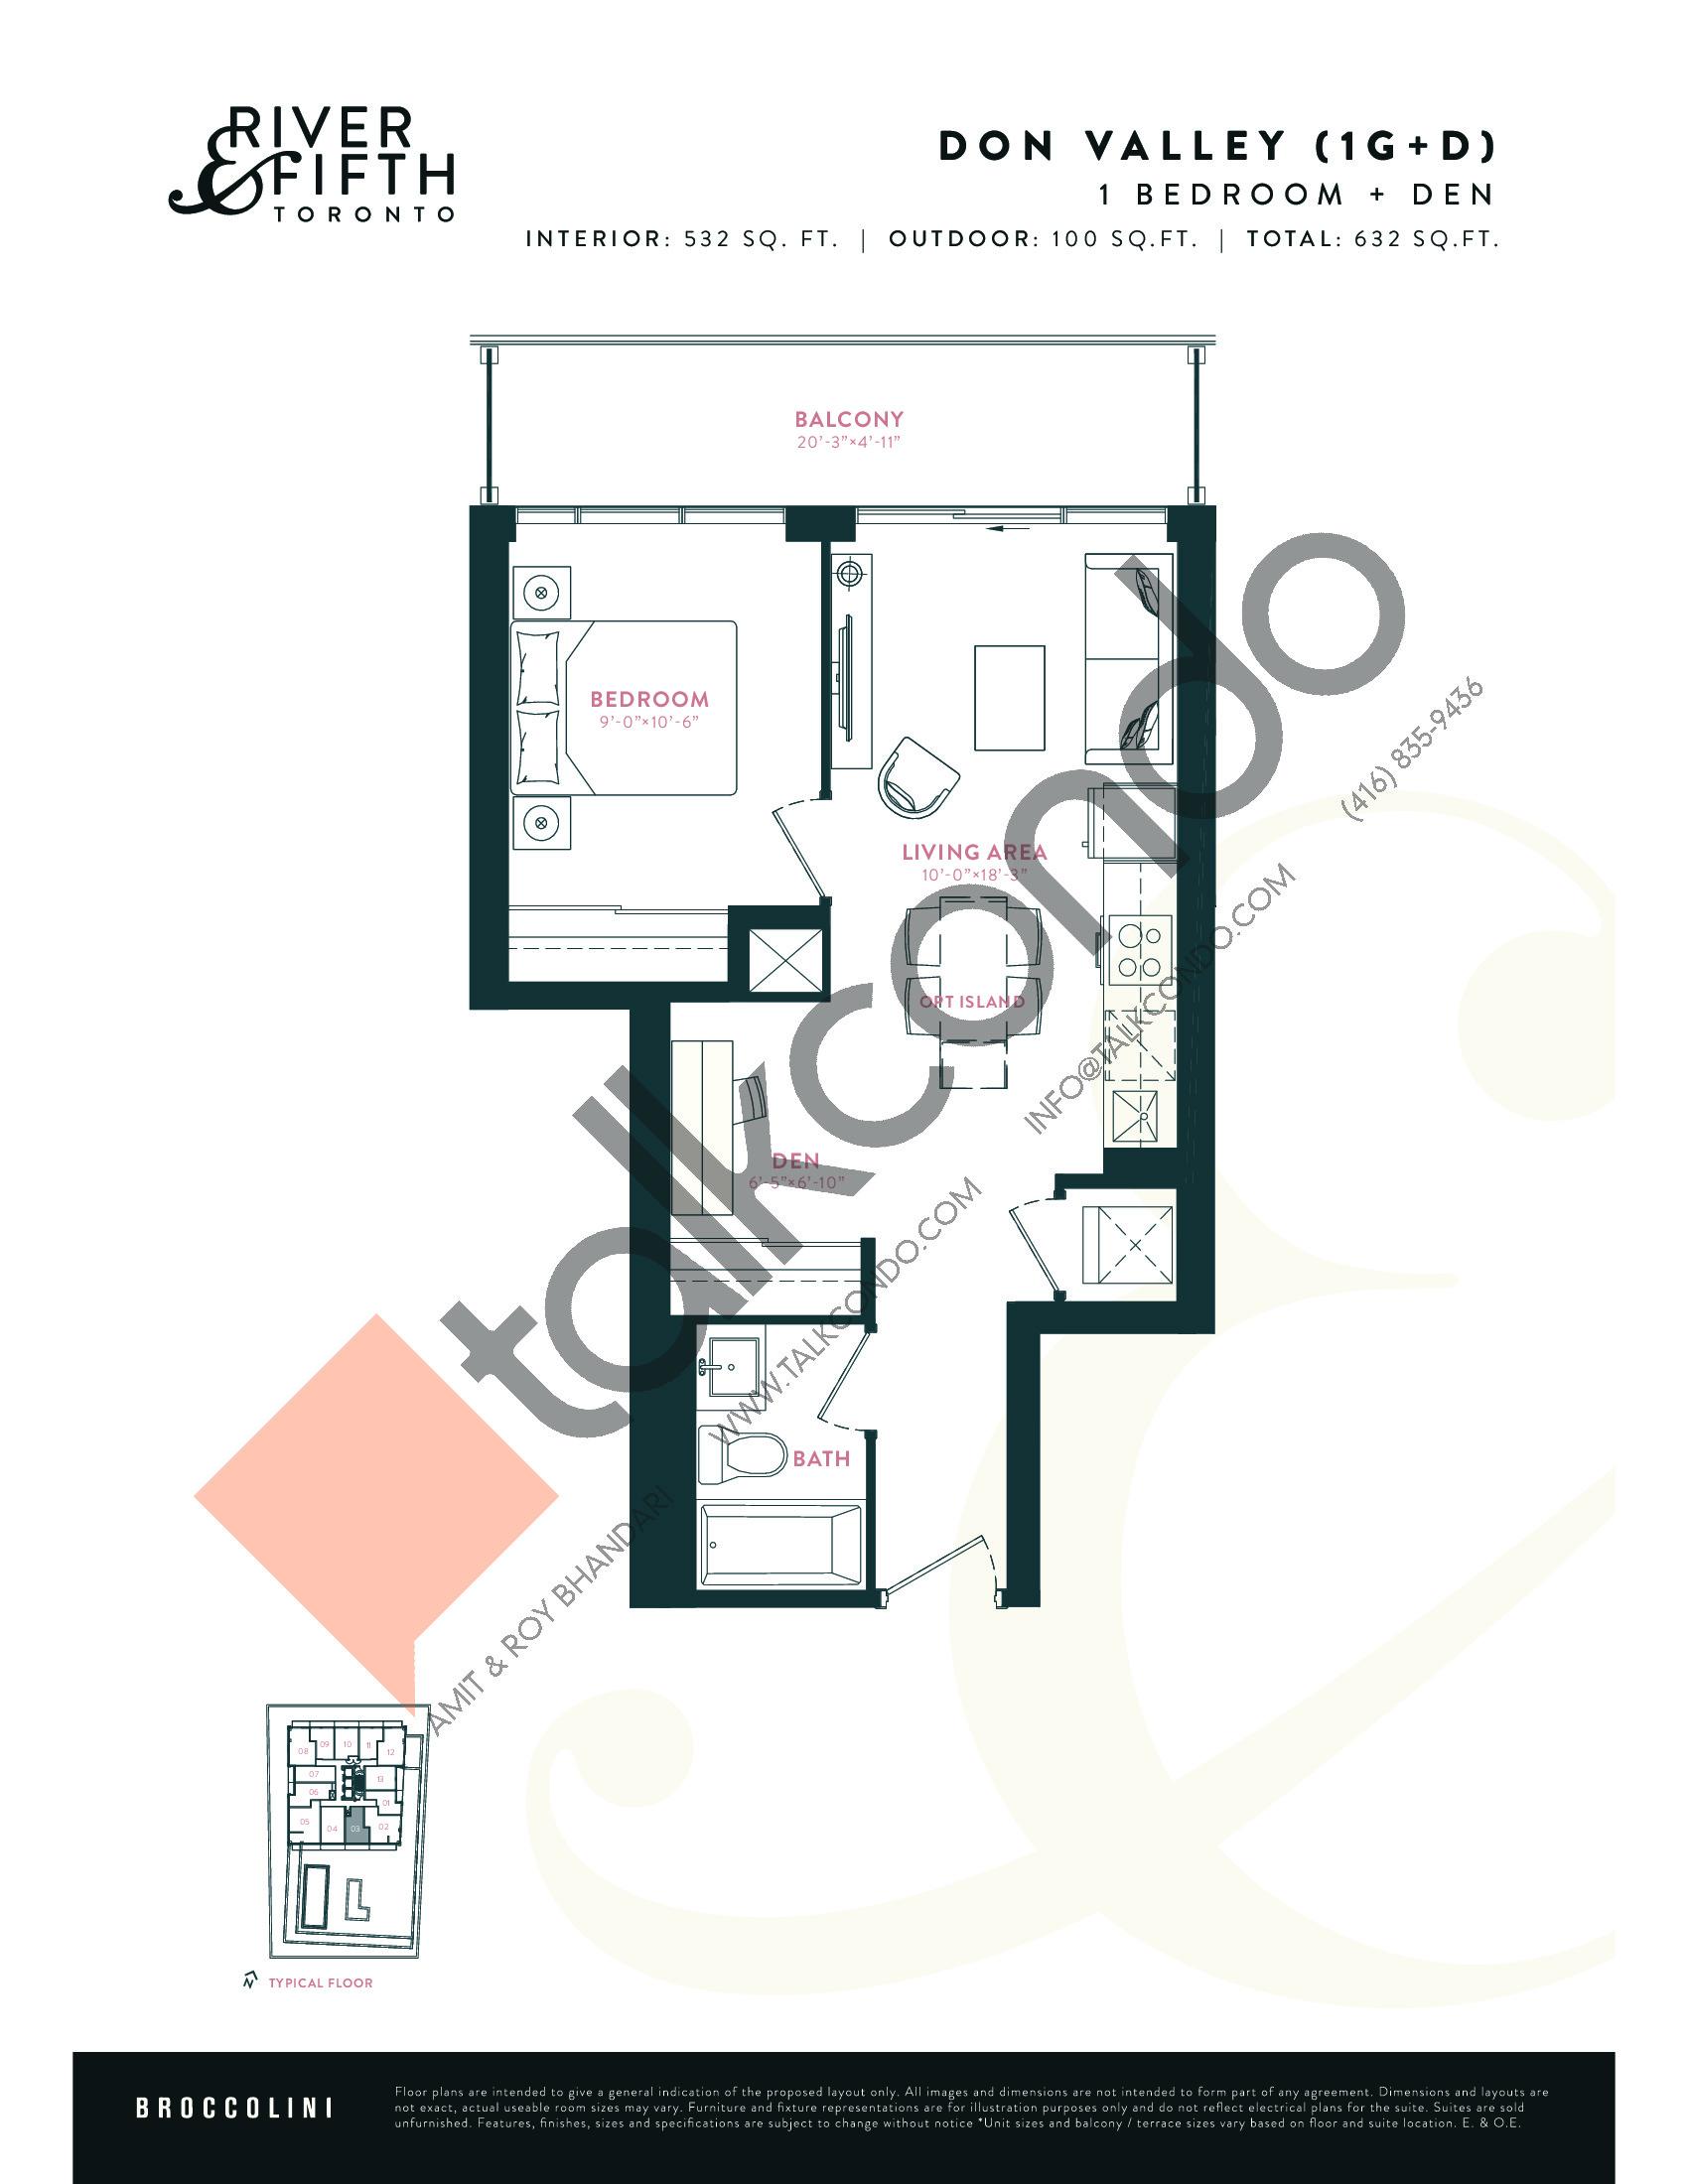 Don Valley (1G+D) Floor Plan at River & Fifth Condos - 532 sq.ft